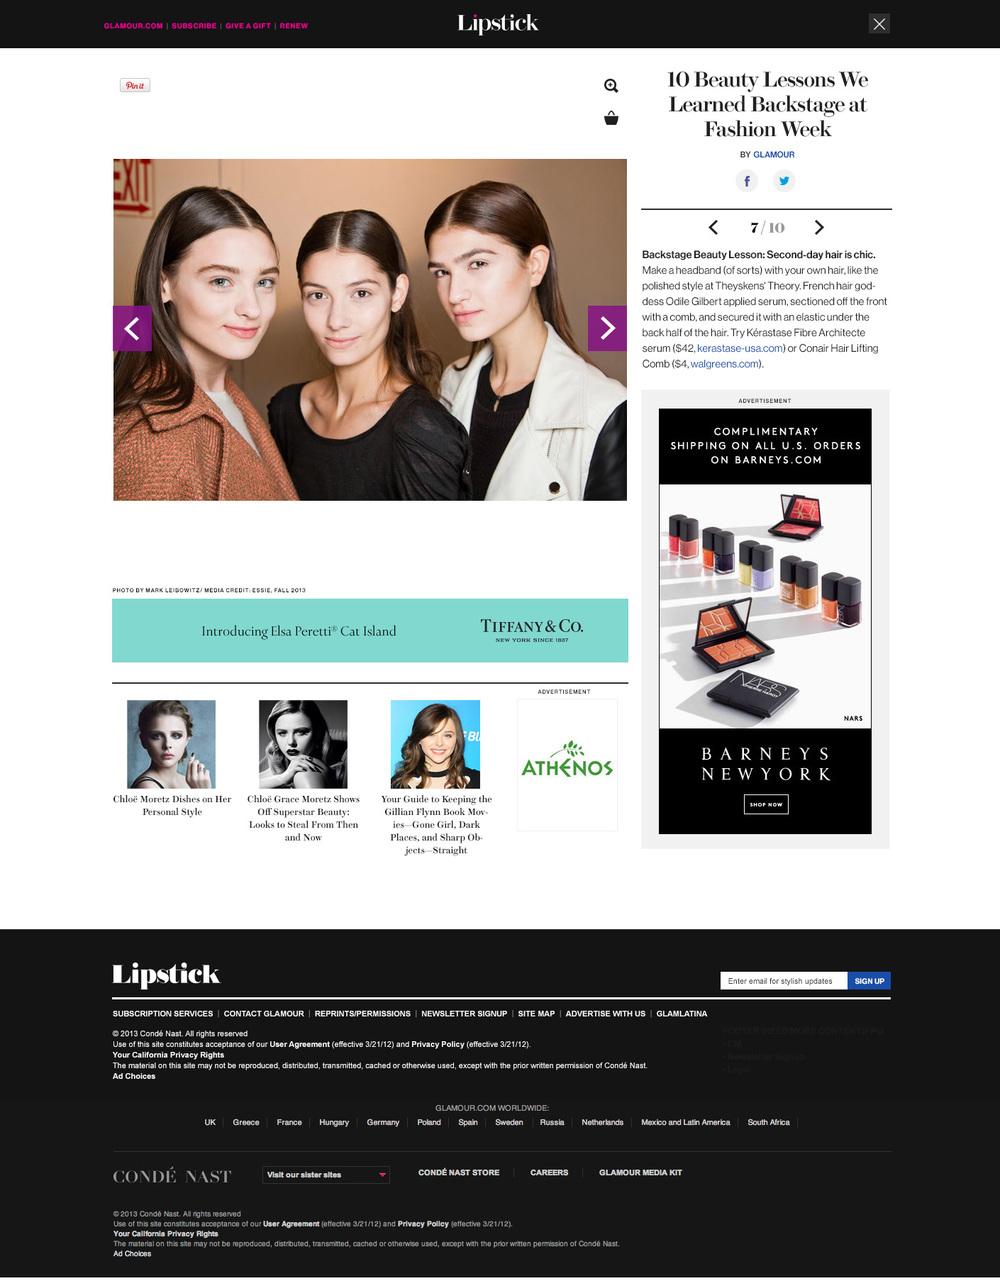 Lipstick_Slideshowf_1_2.jpg